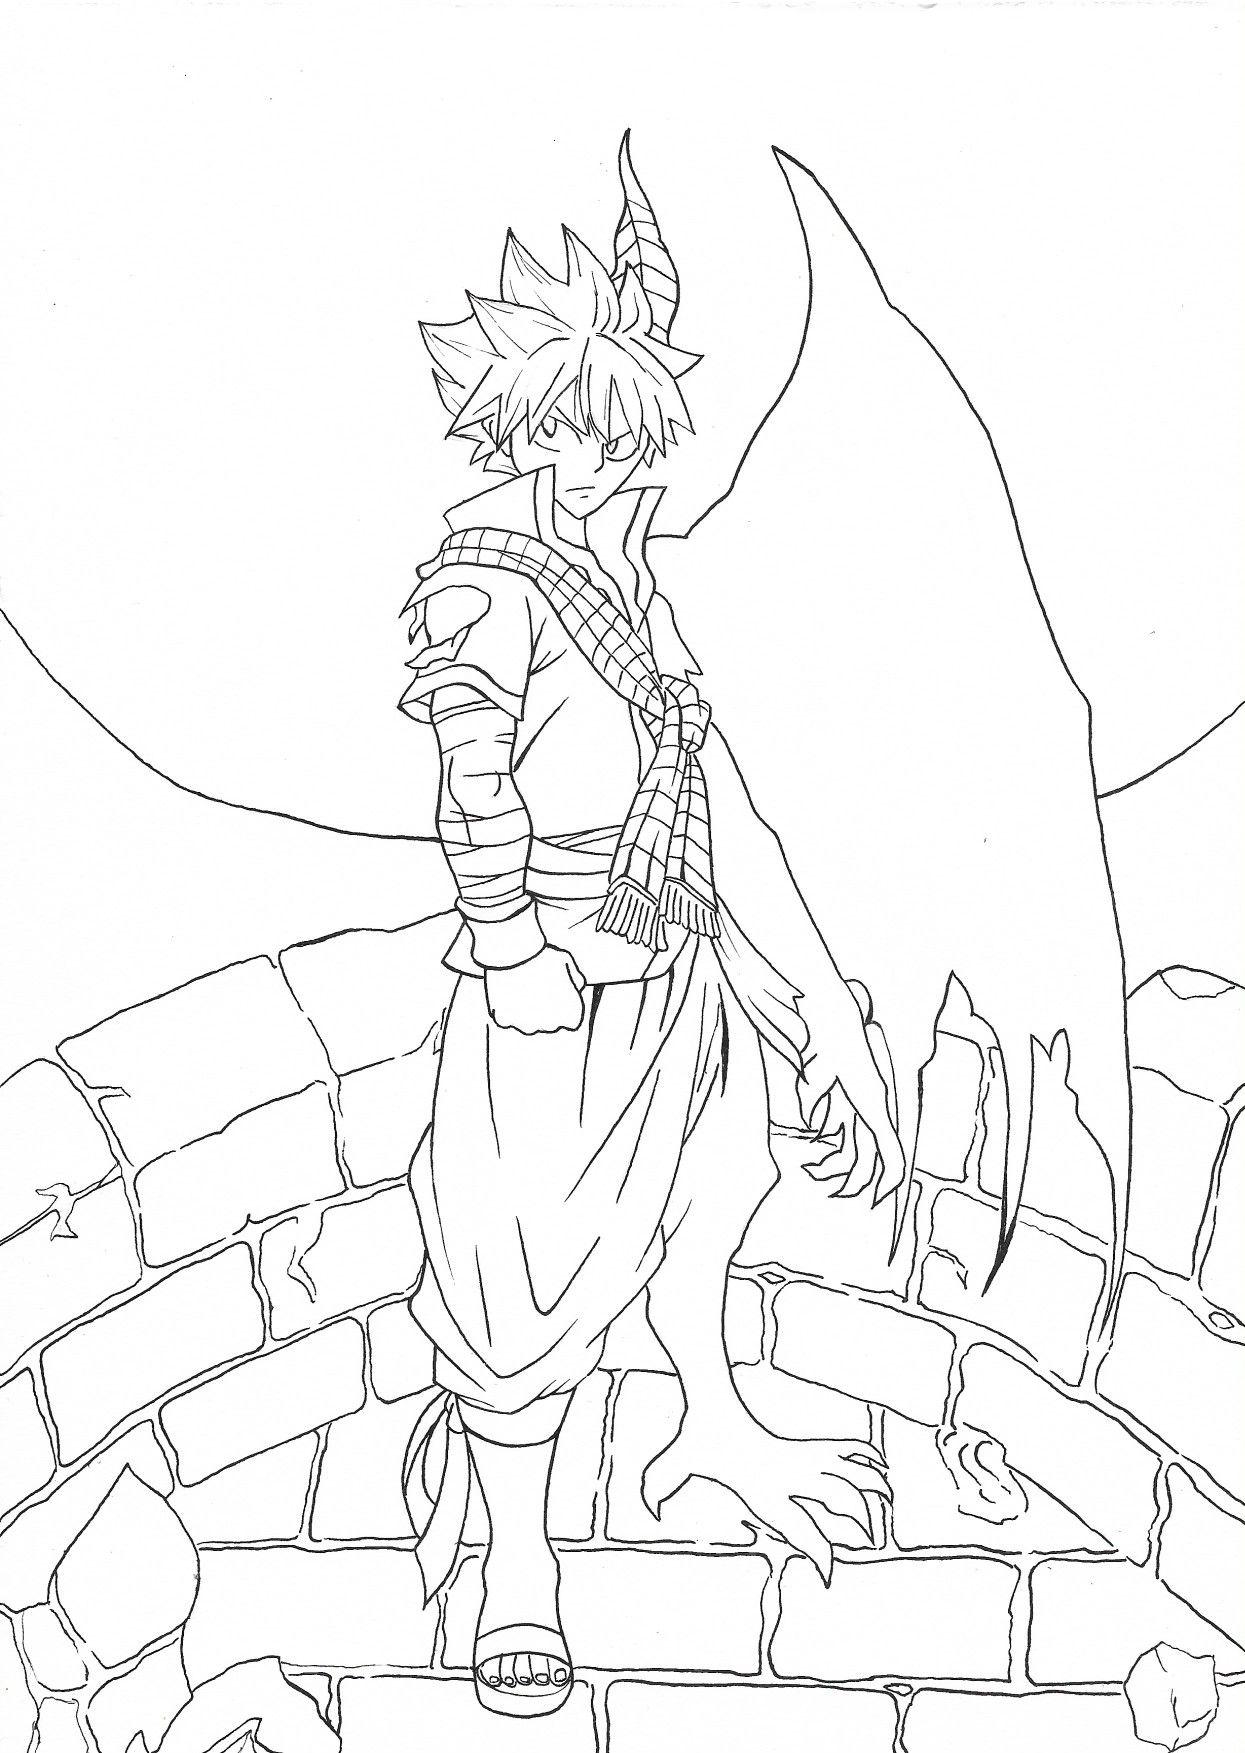 Natsu Dragneel Animacoes De Contos De Fada Desenhos De Anime Arte